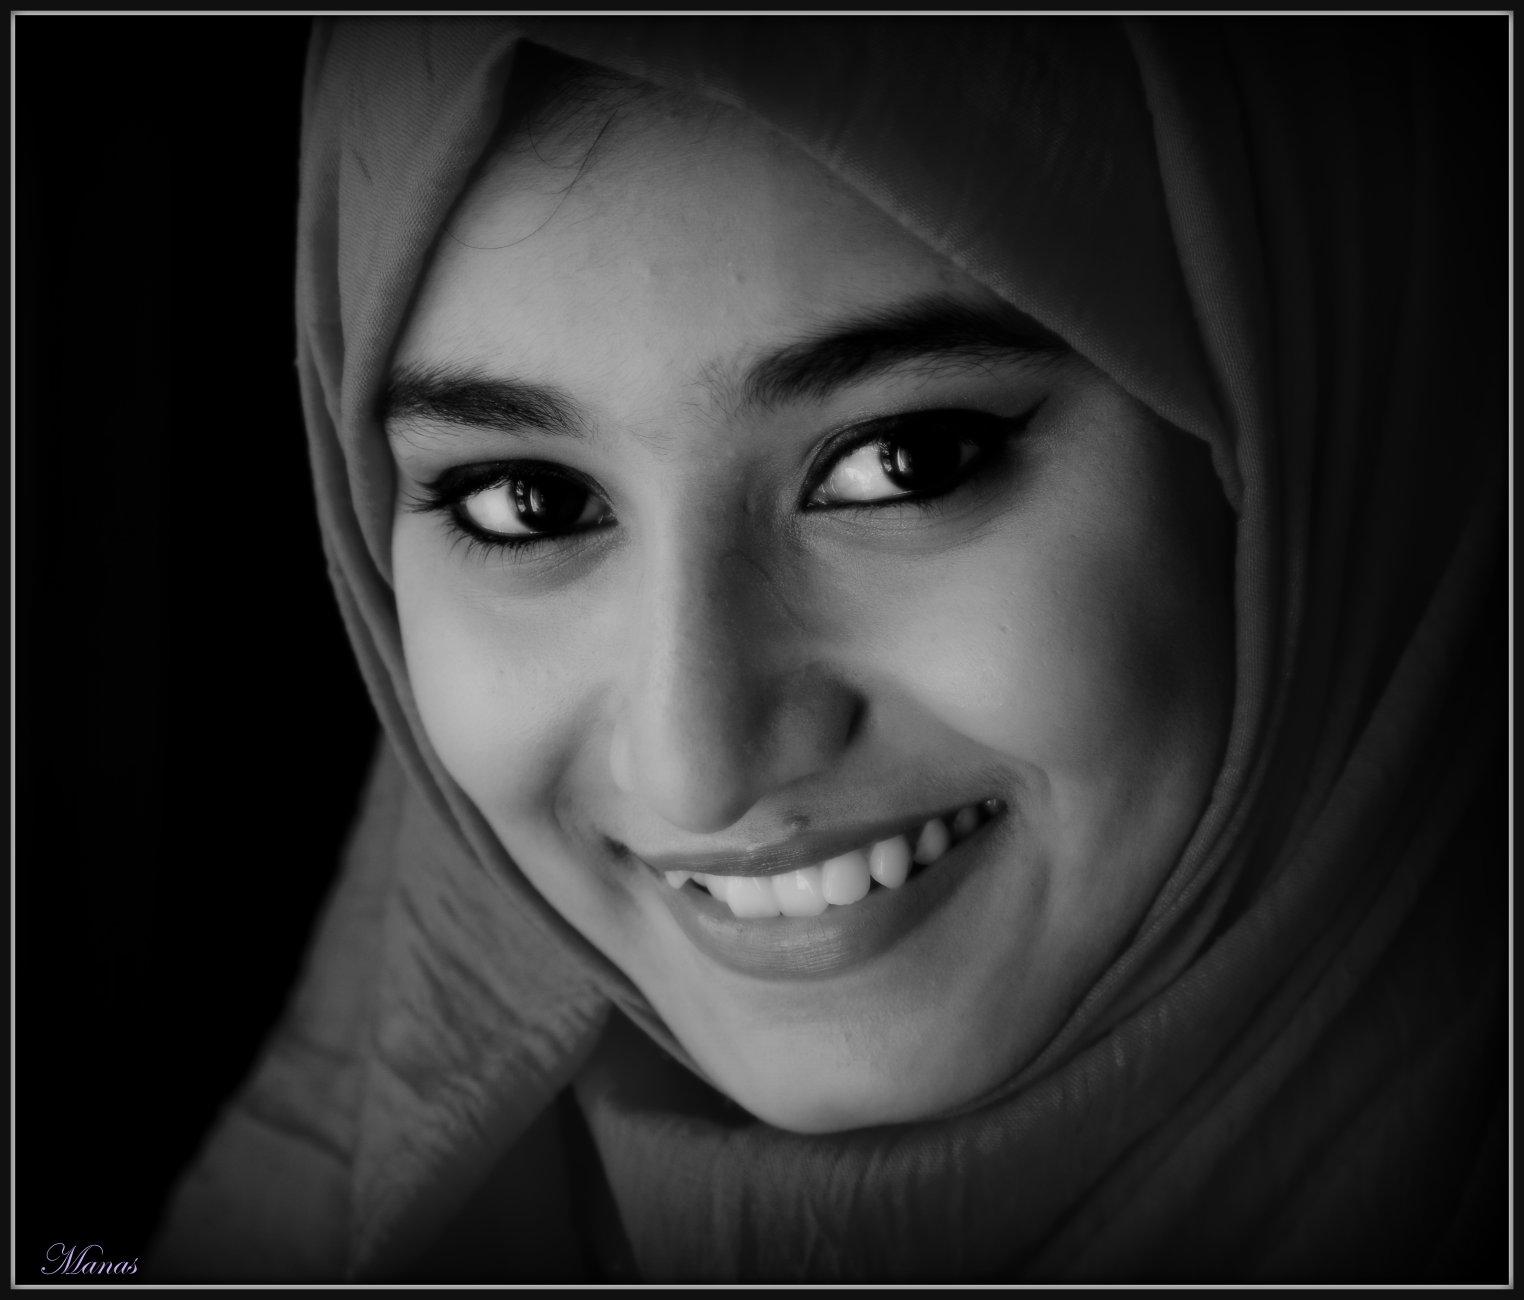 The smiling eyes.